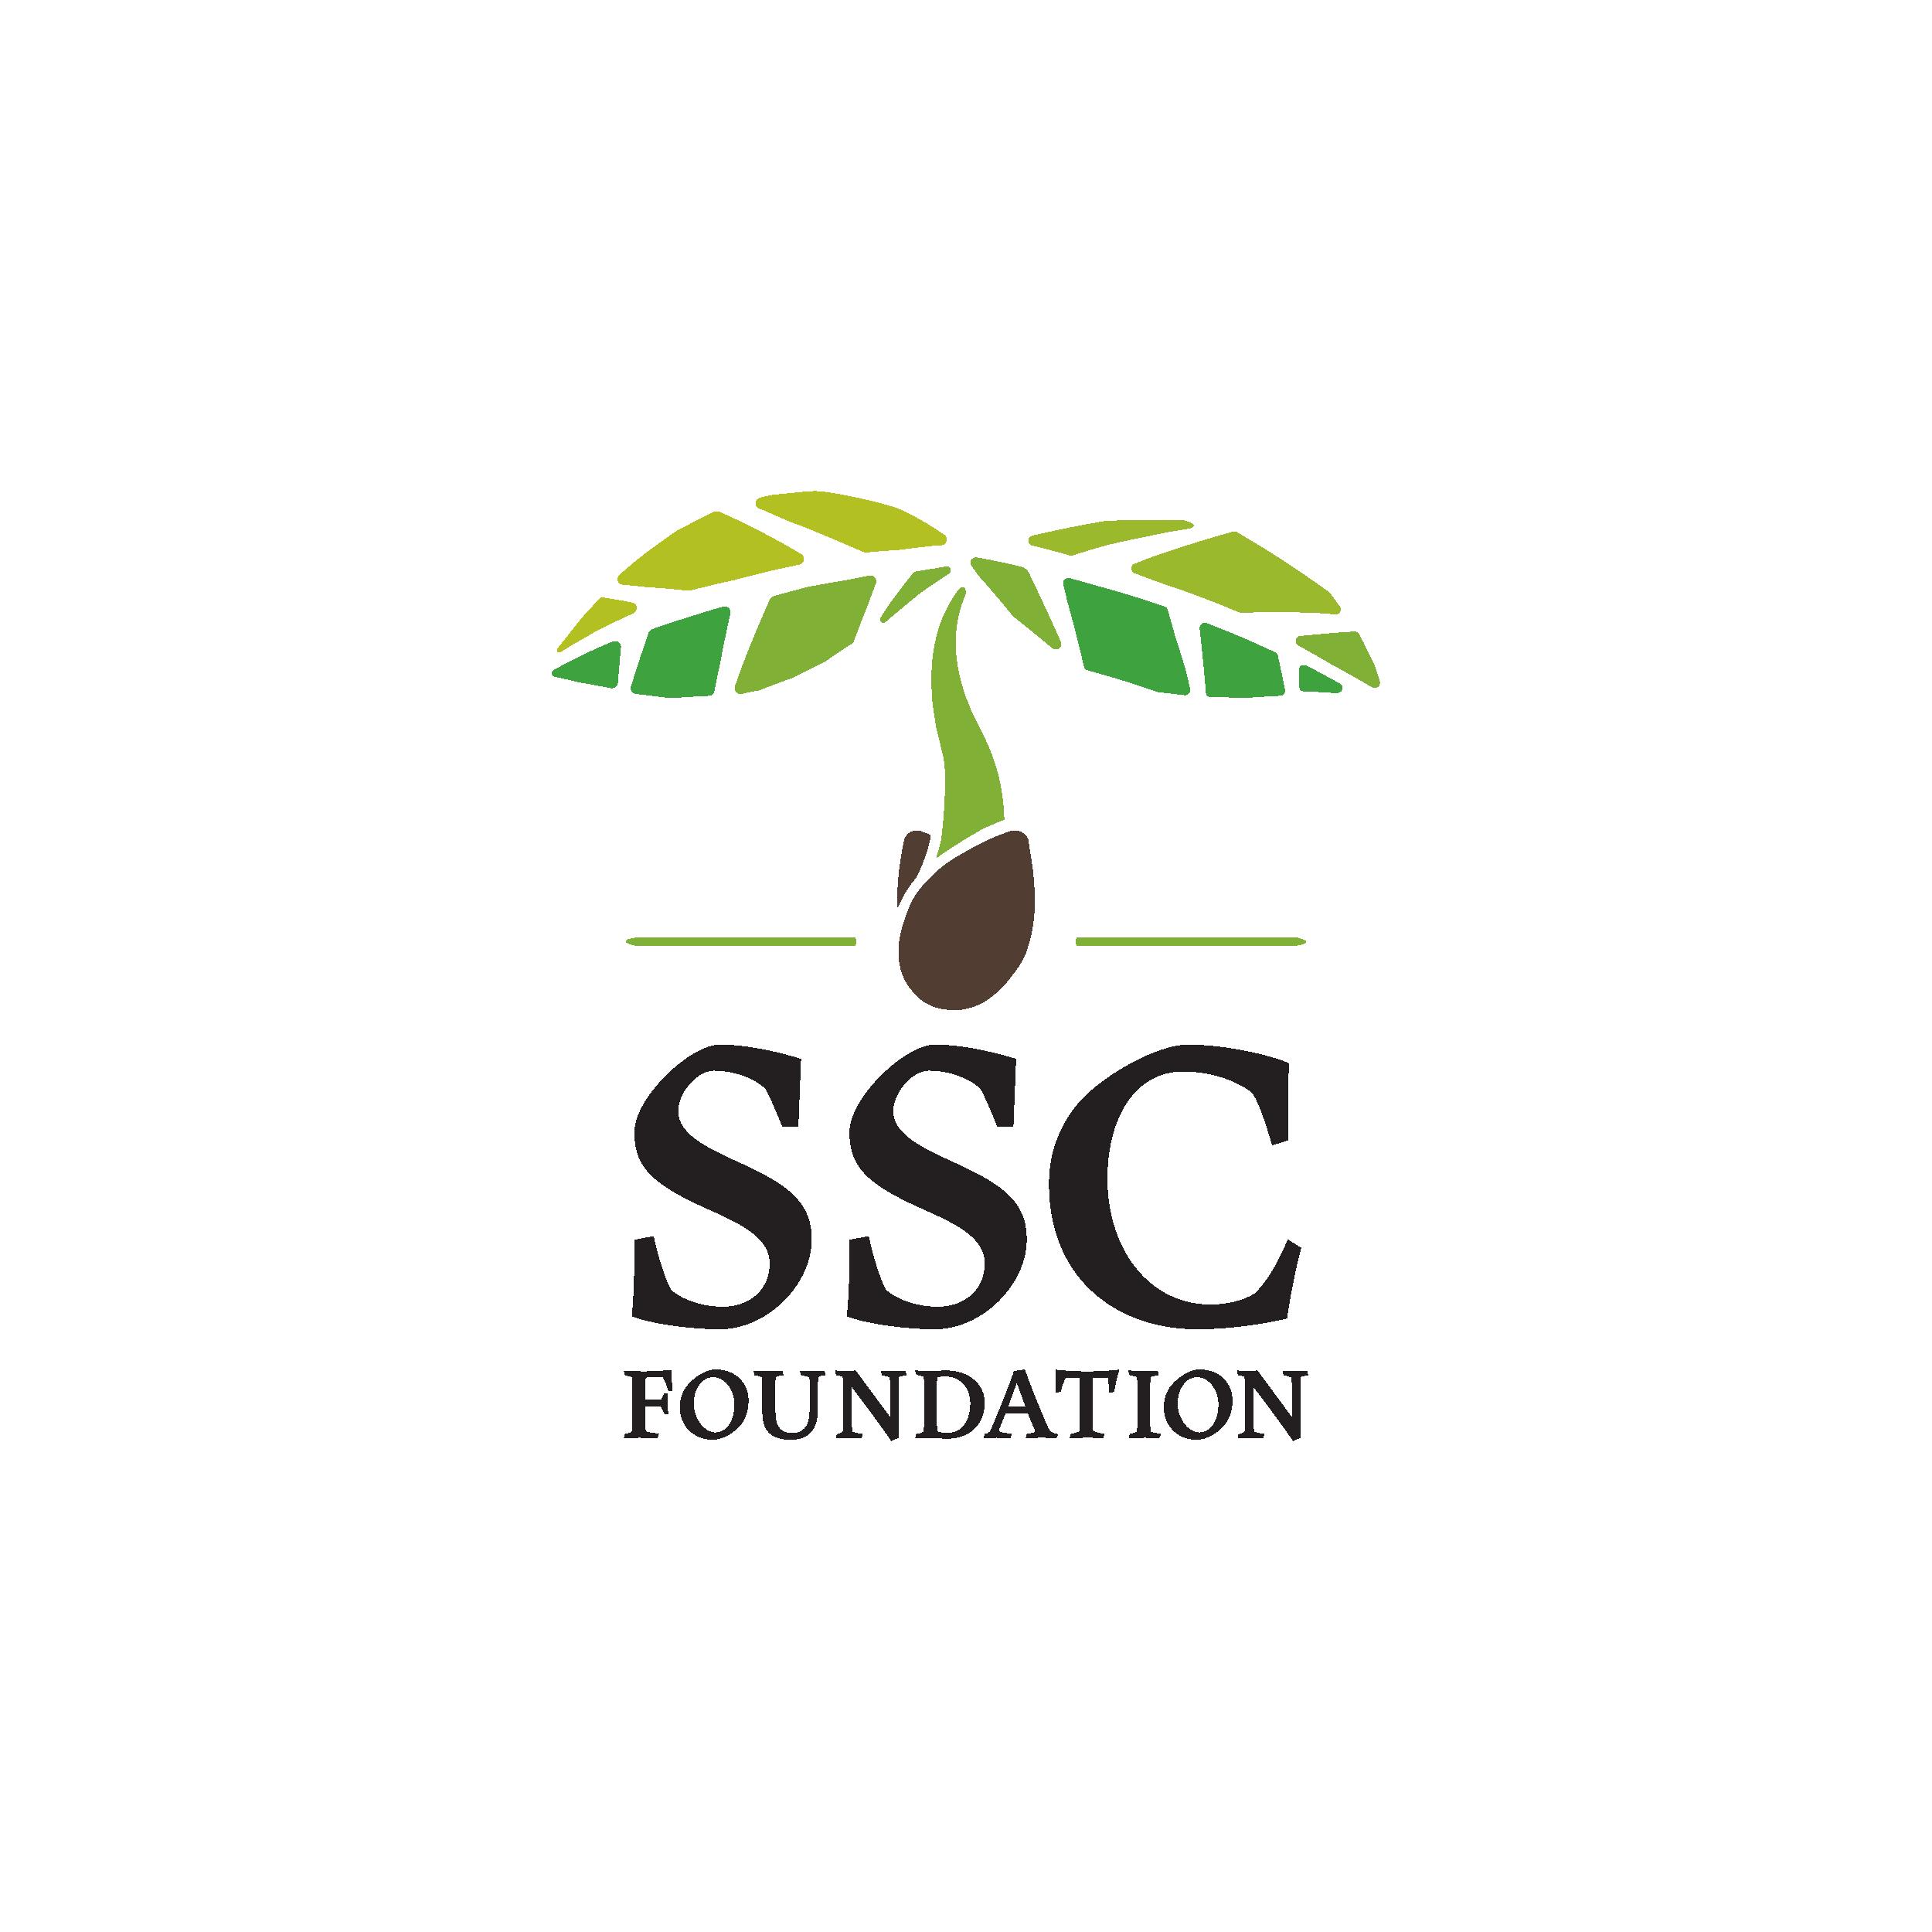 SSC Foundation